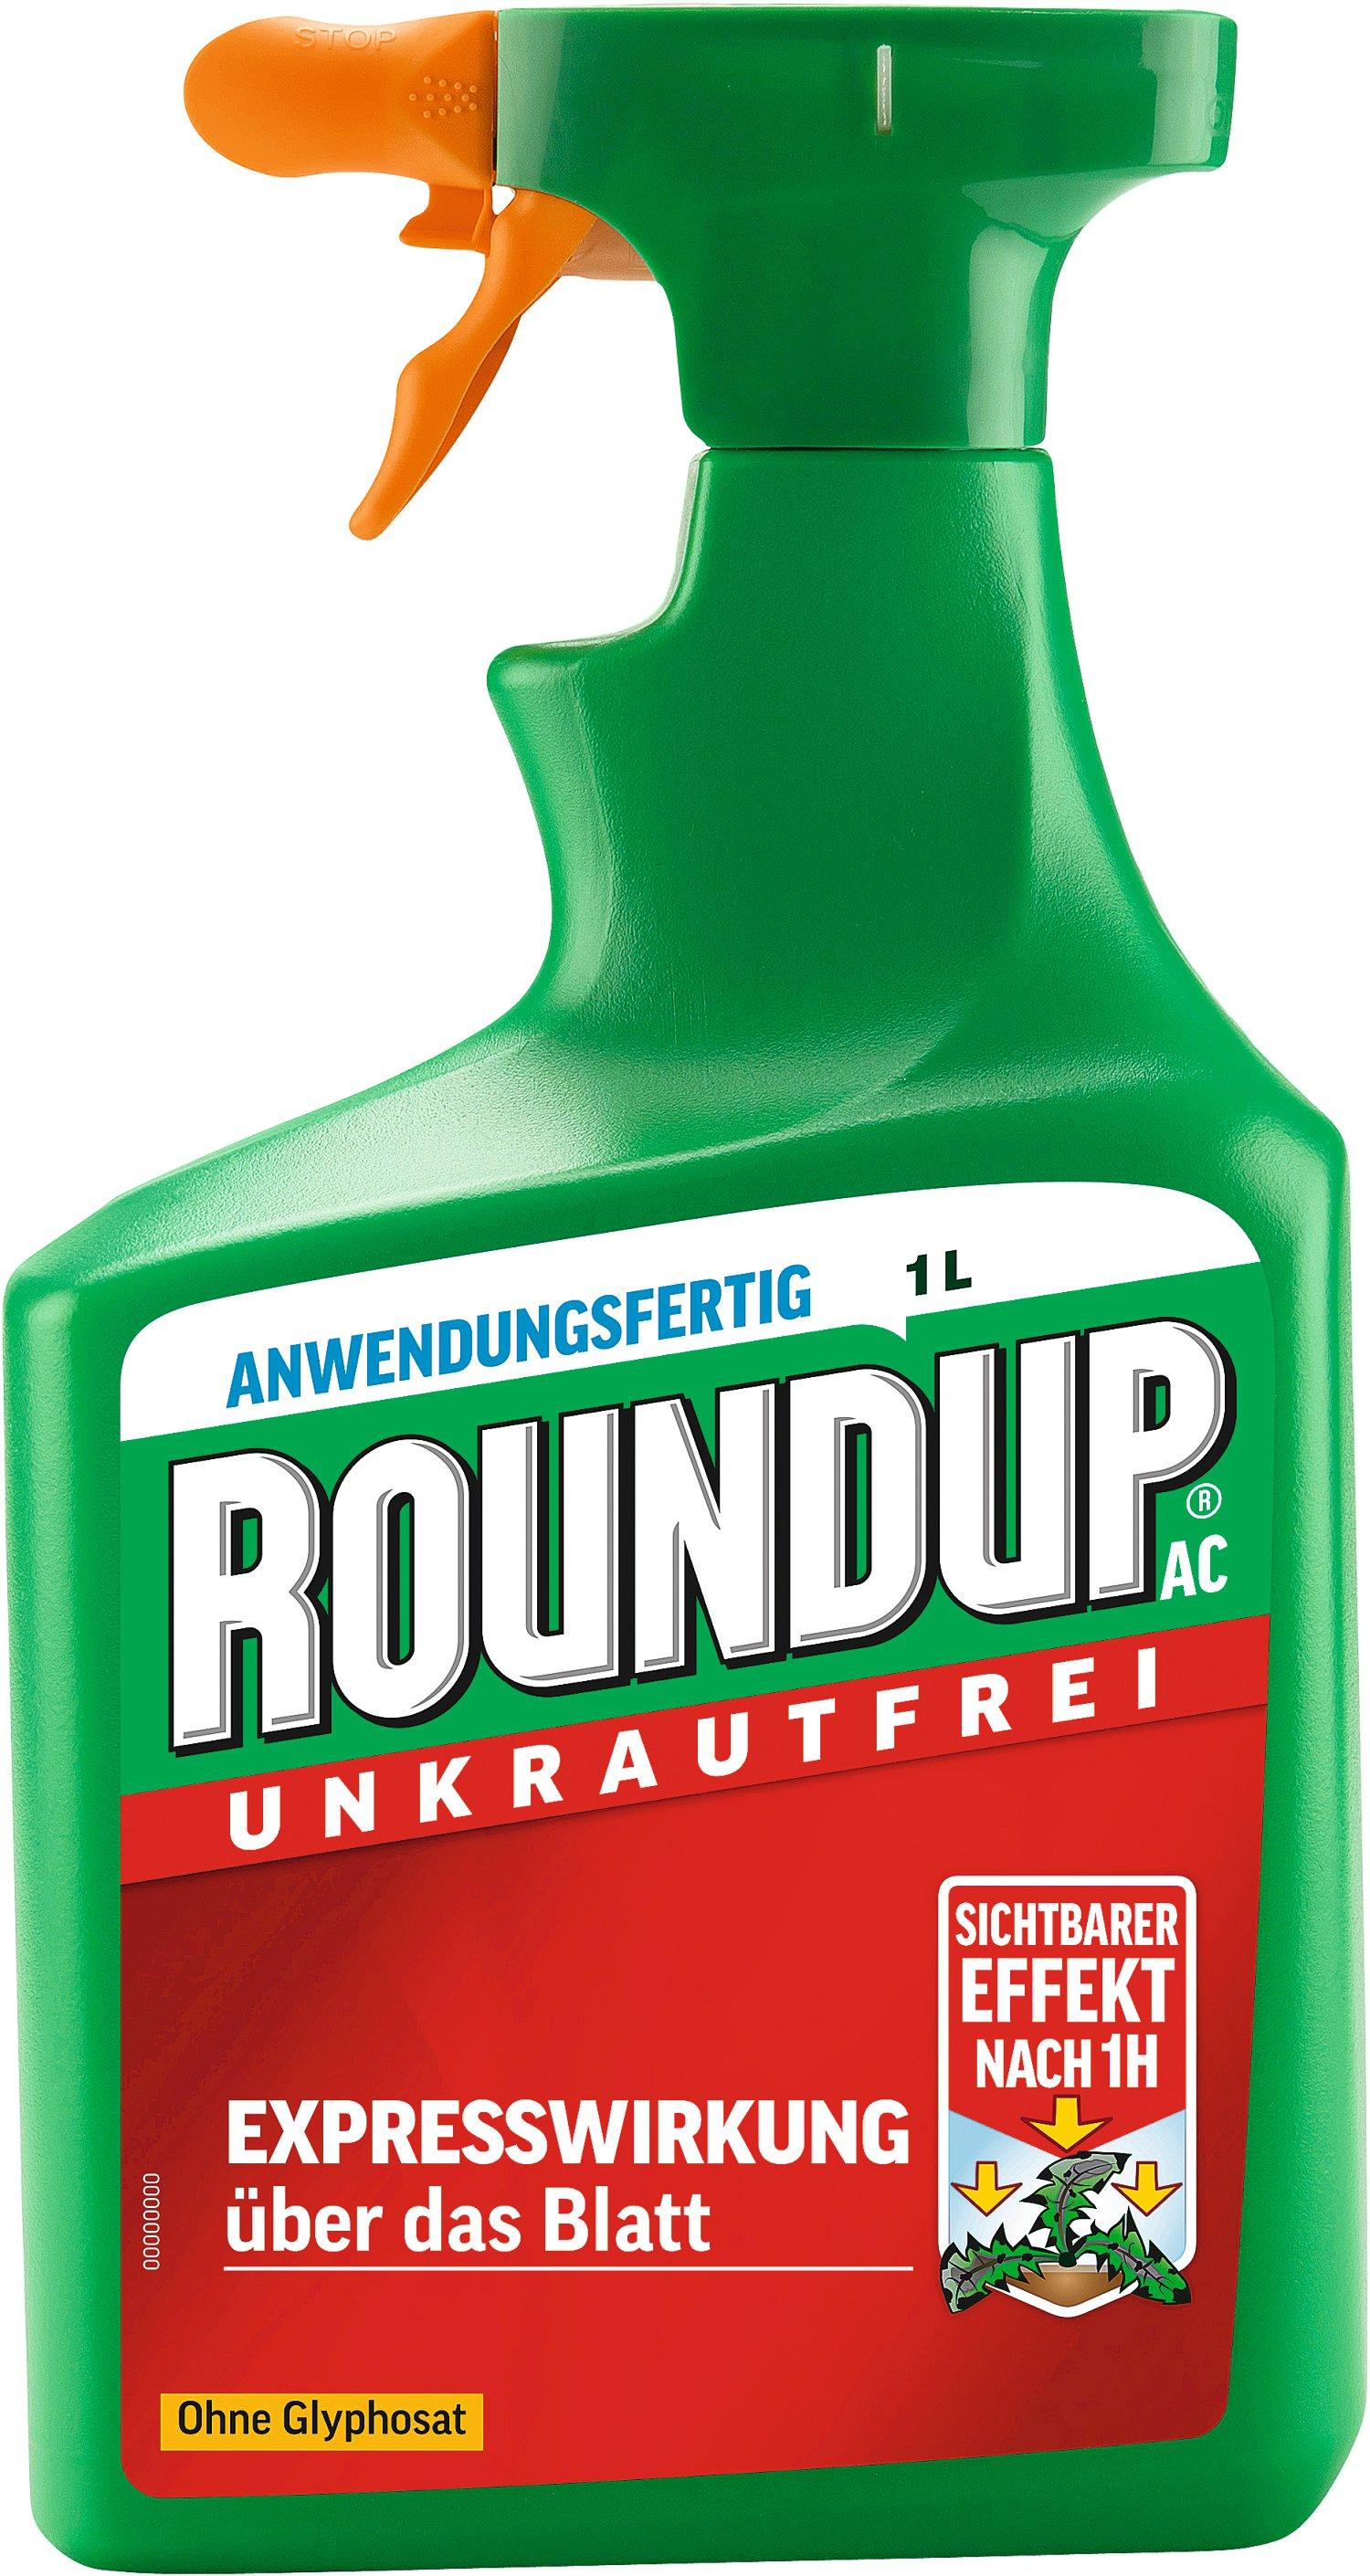 Roundup Unkrautfrei AC, 1 l | Lagerhaus